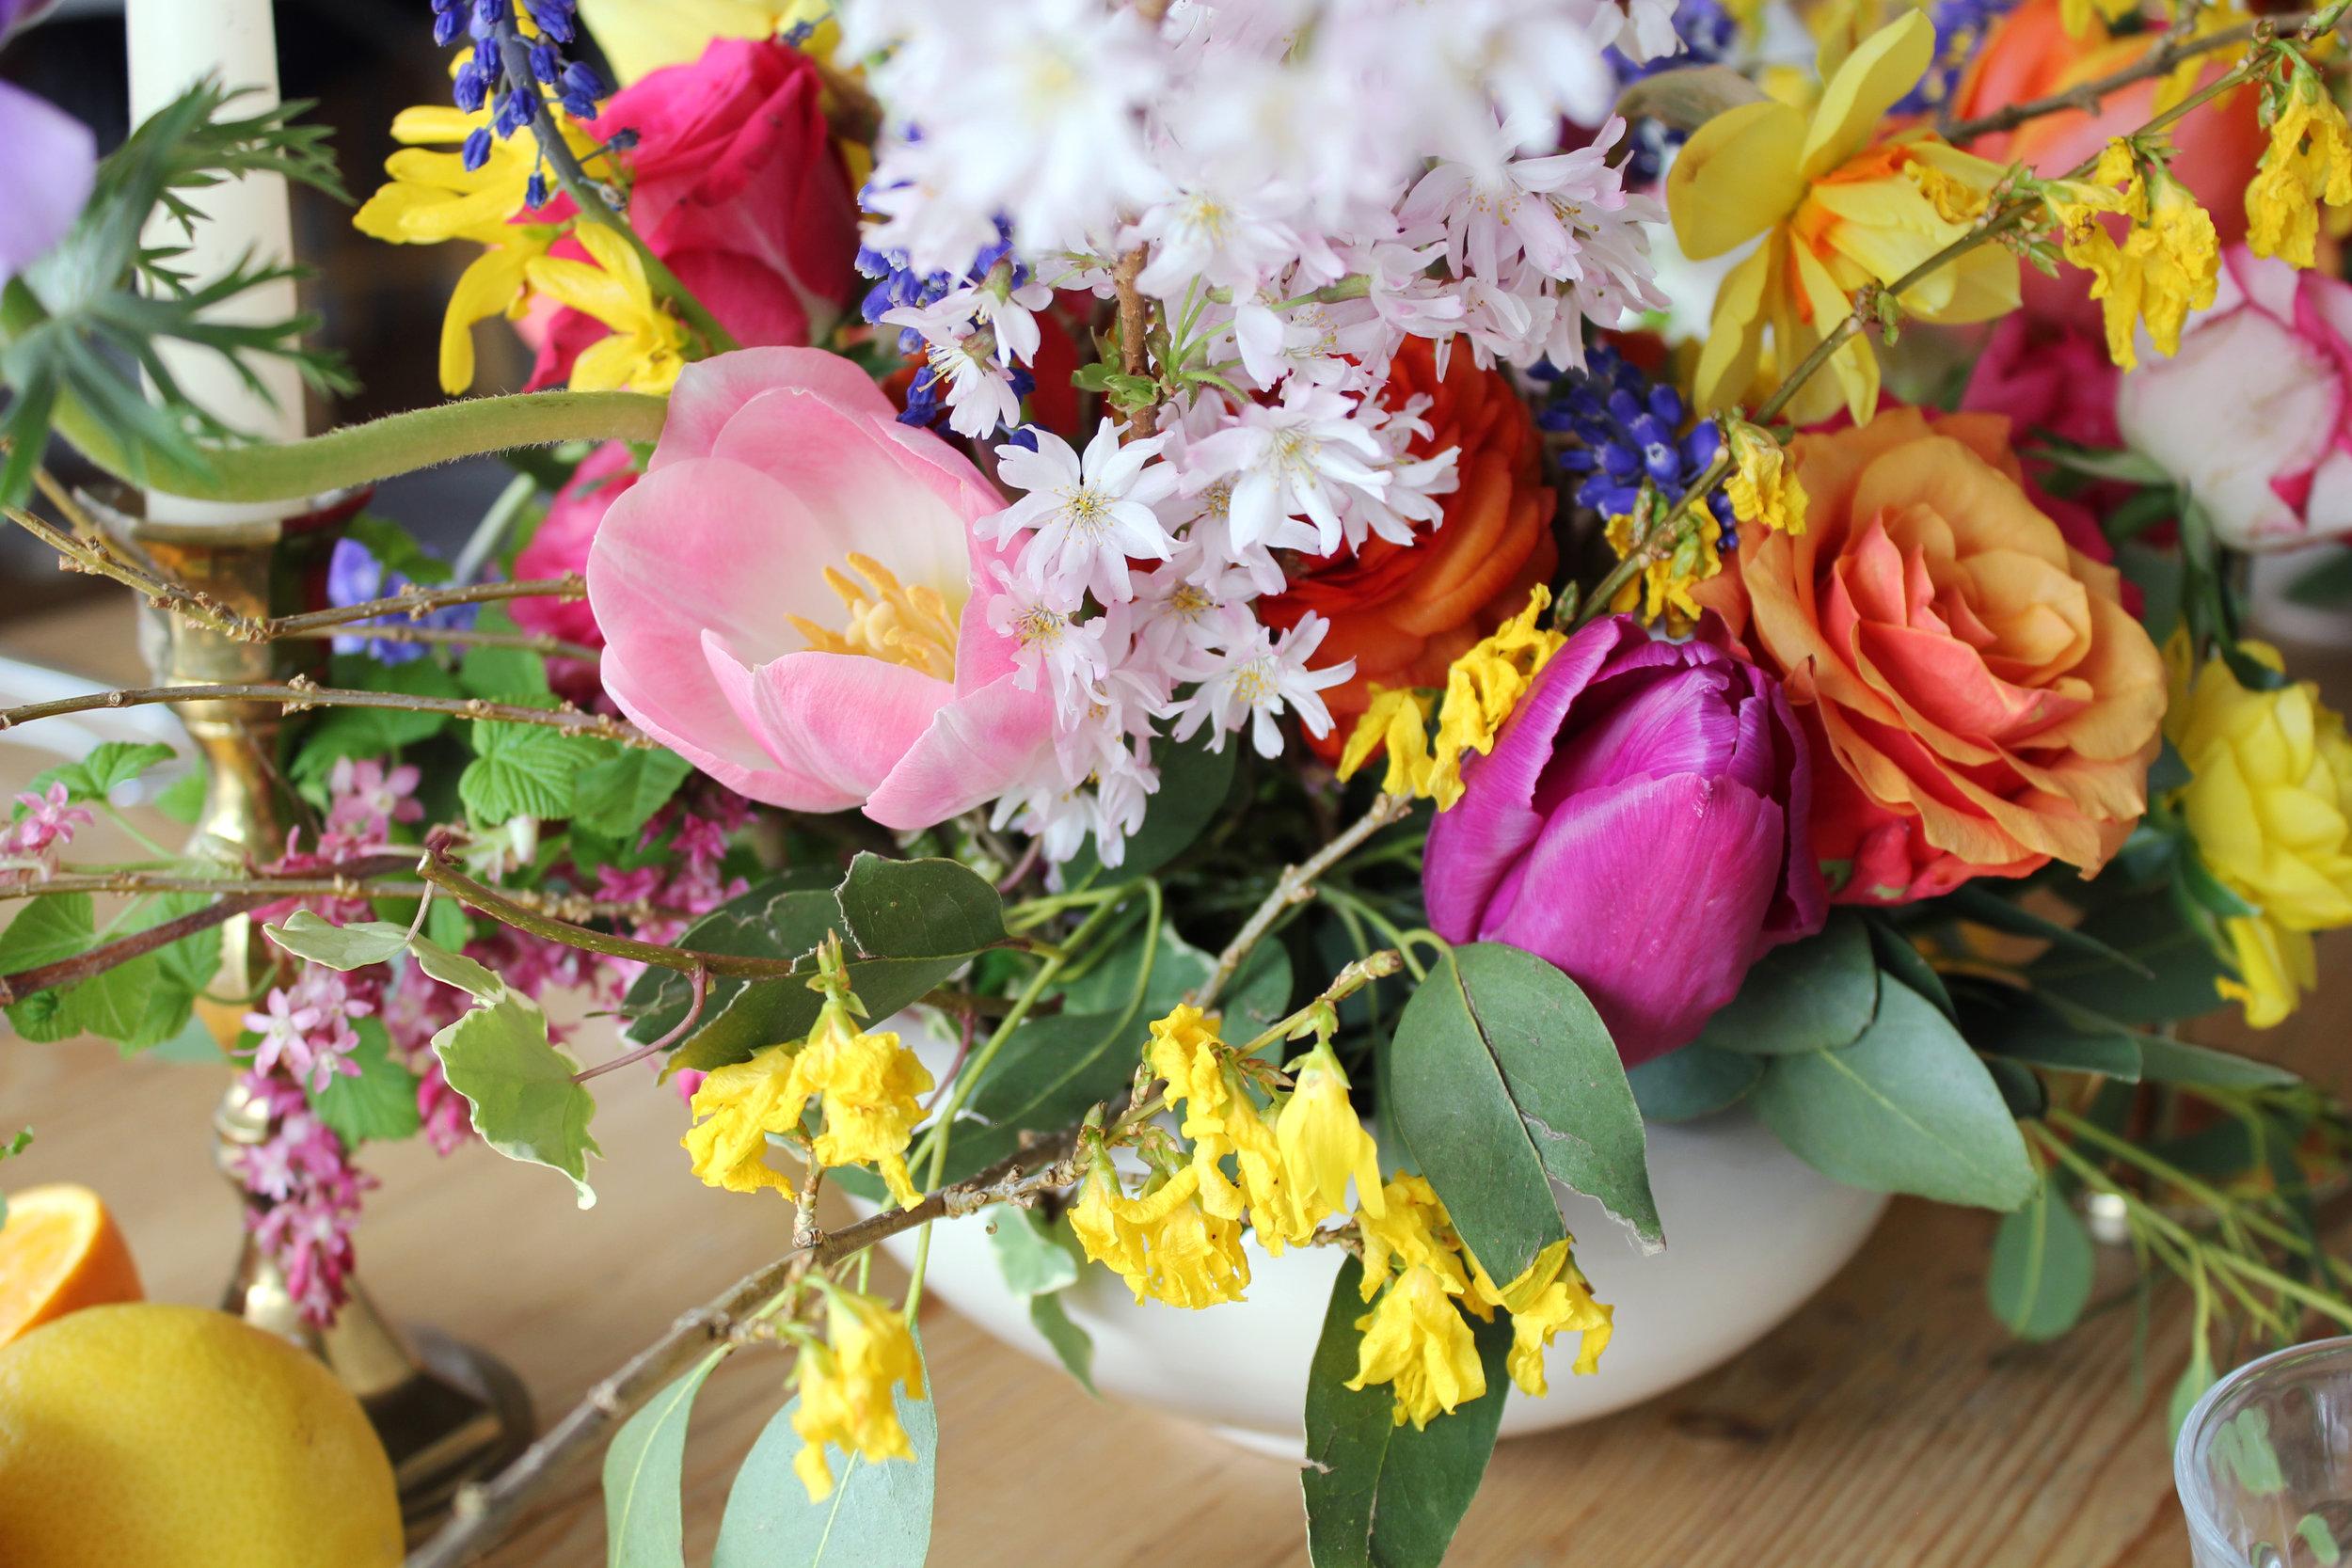 Callie-Pettigrew-Fruity-Florals-16.jpg